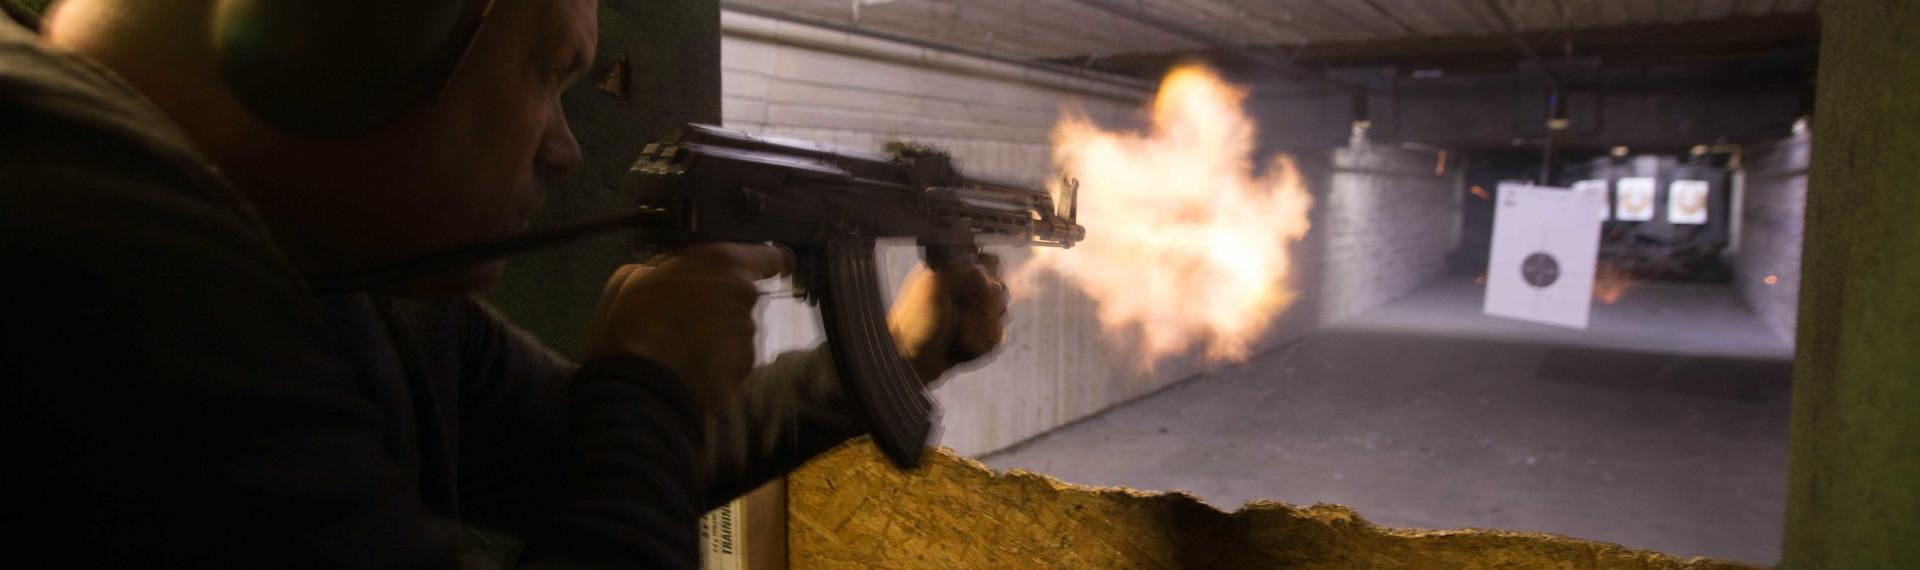 AK-47 Puissante Budapest